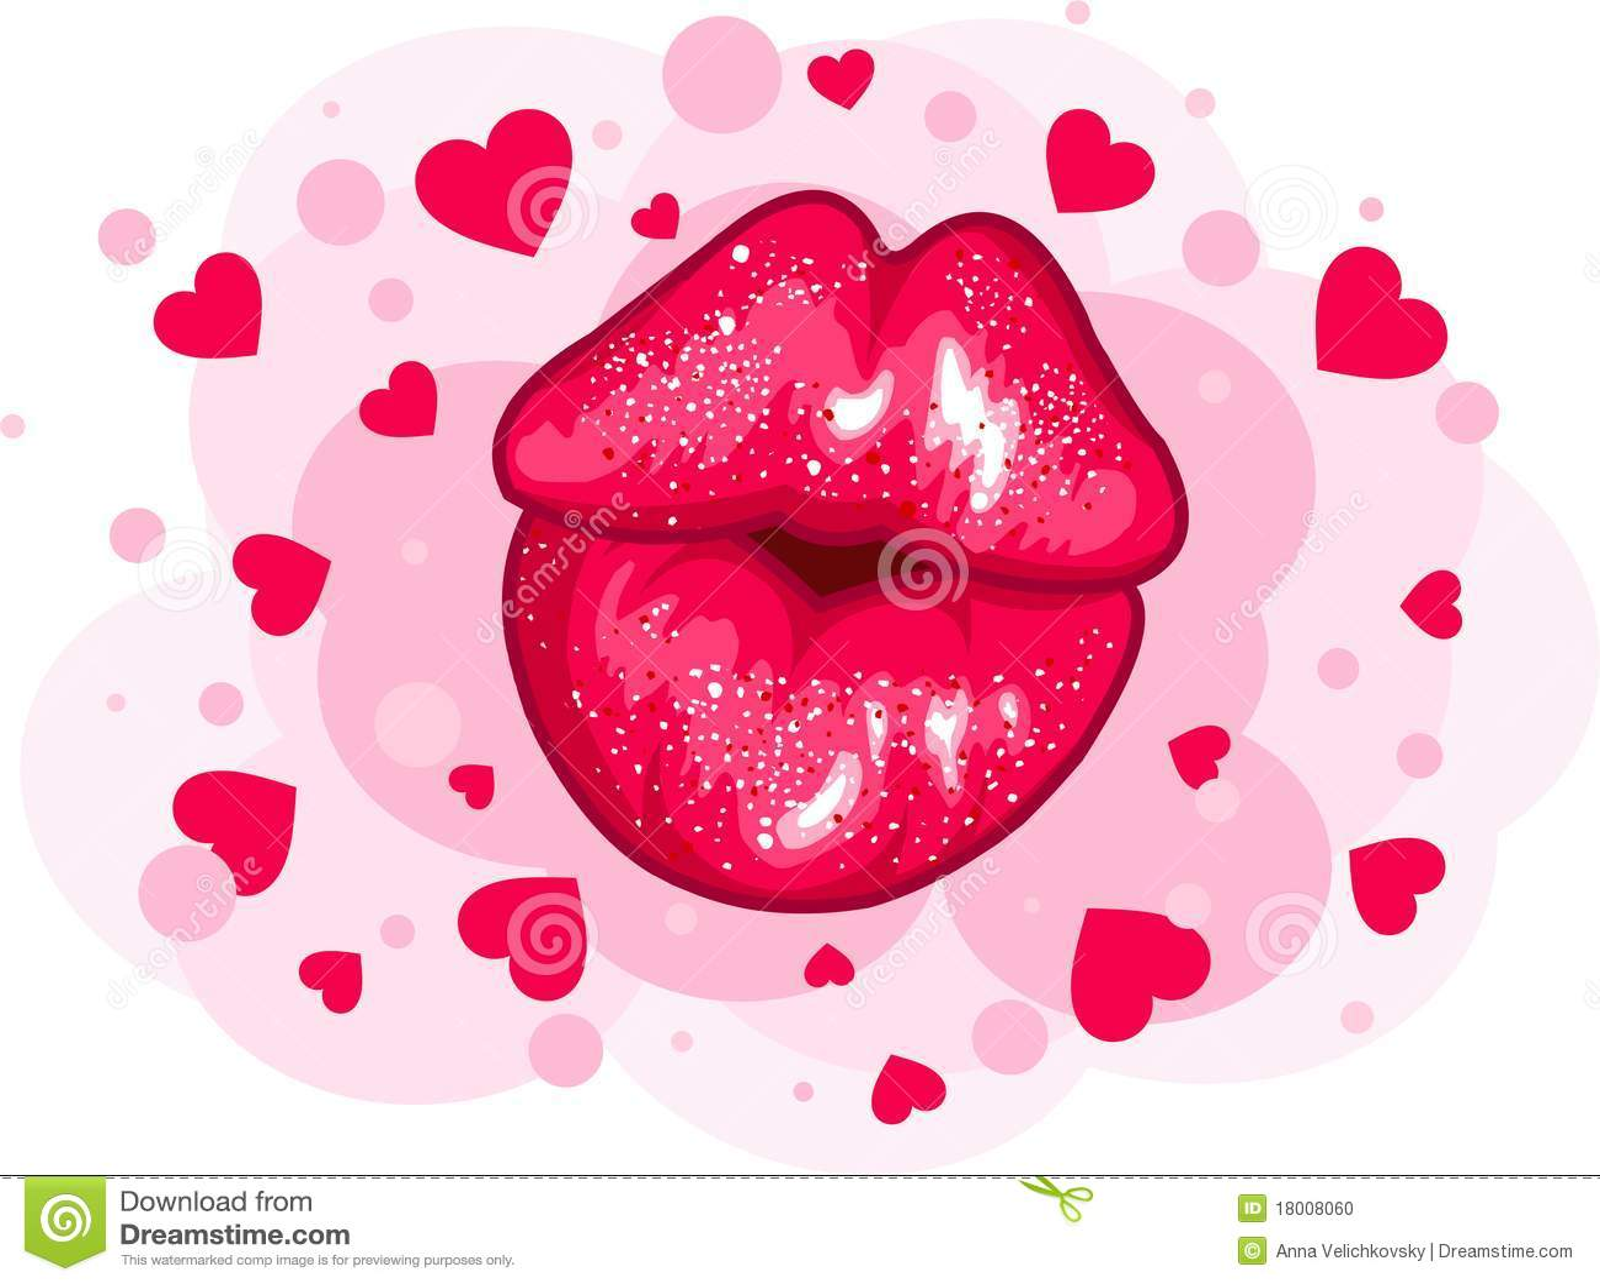 Love Kiss Design Stock Photo Image: 18008060 - 1300x1060 - jpeg